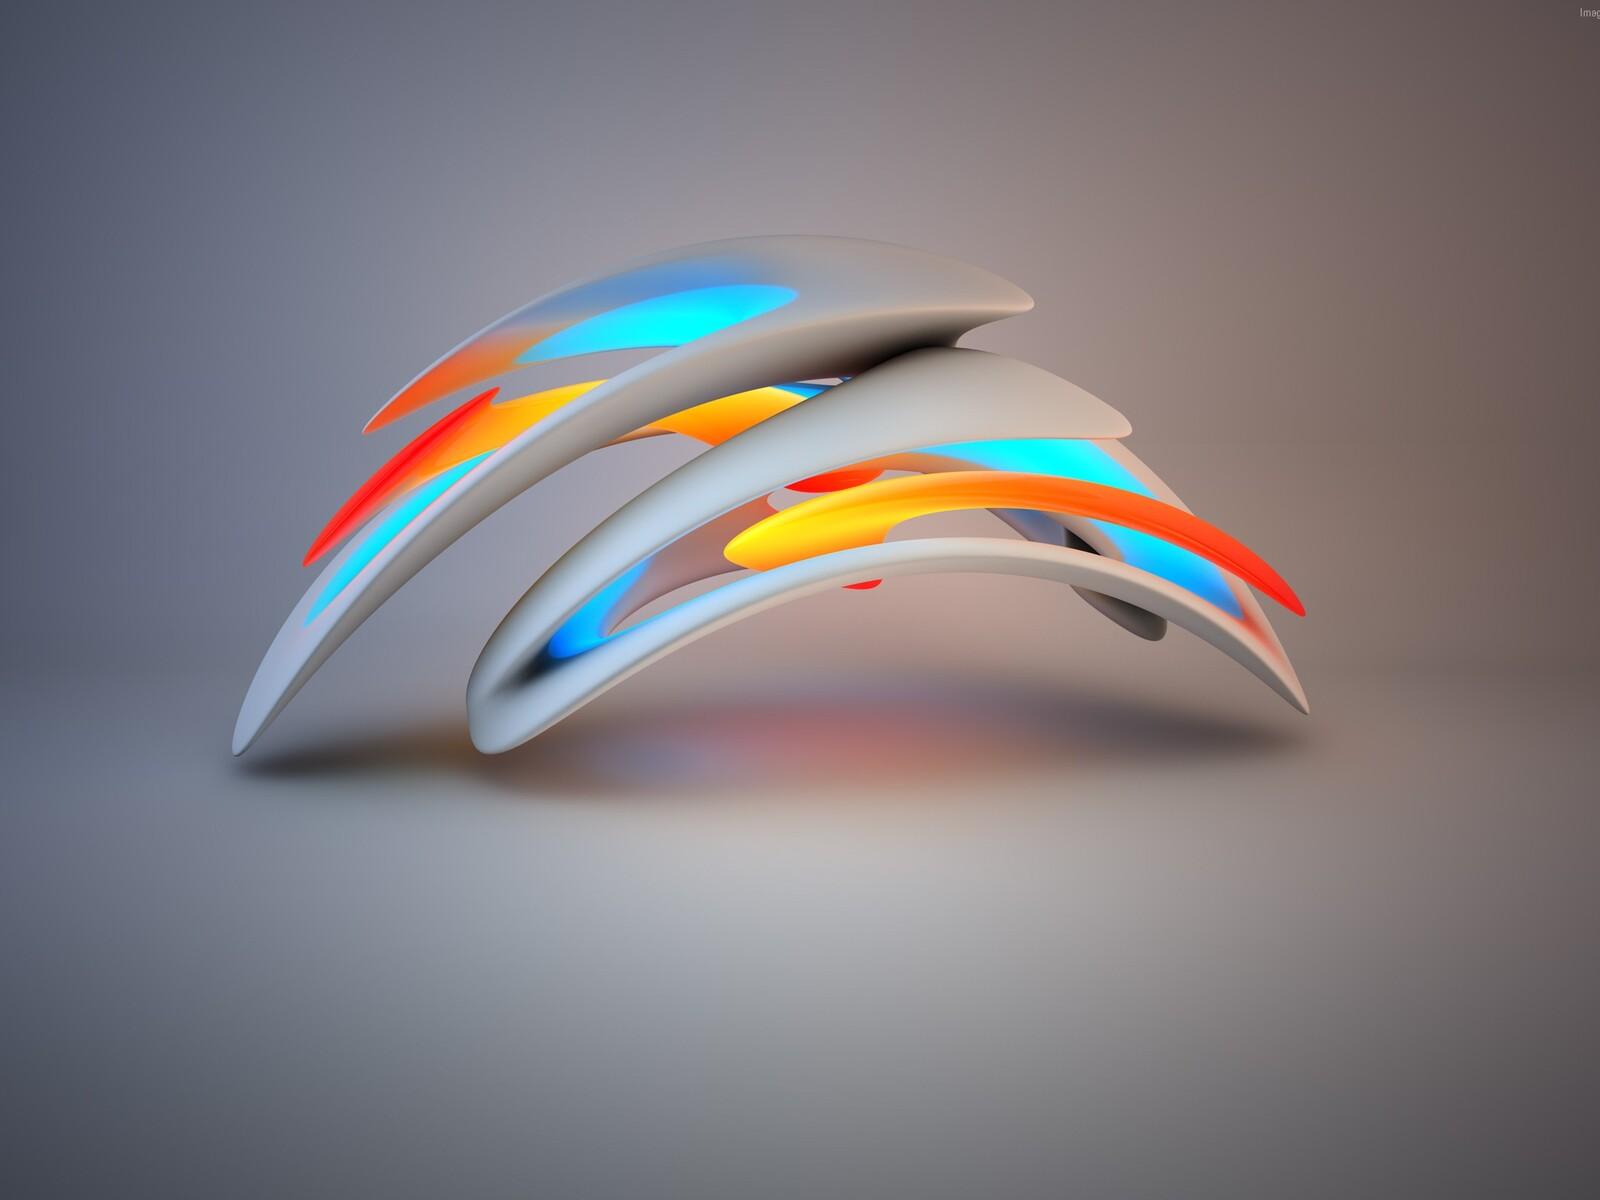 3d-abstract-artwork-hd.jpg